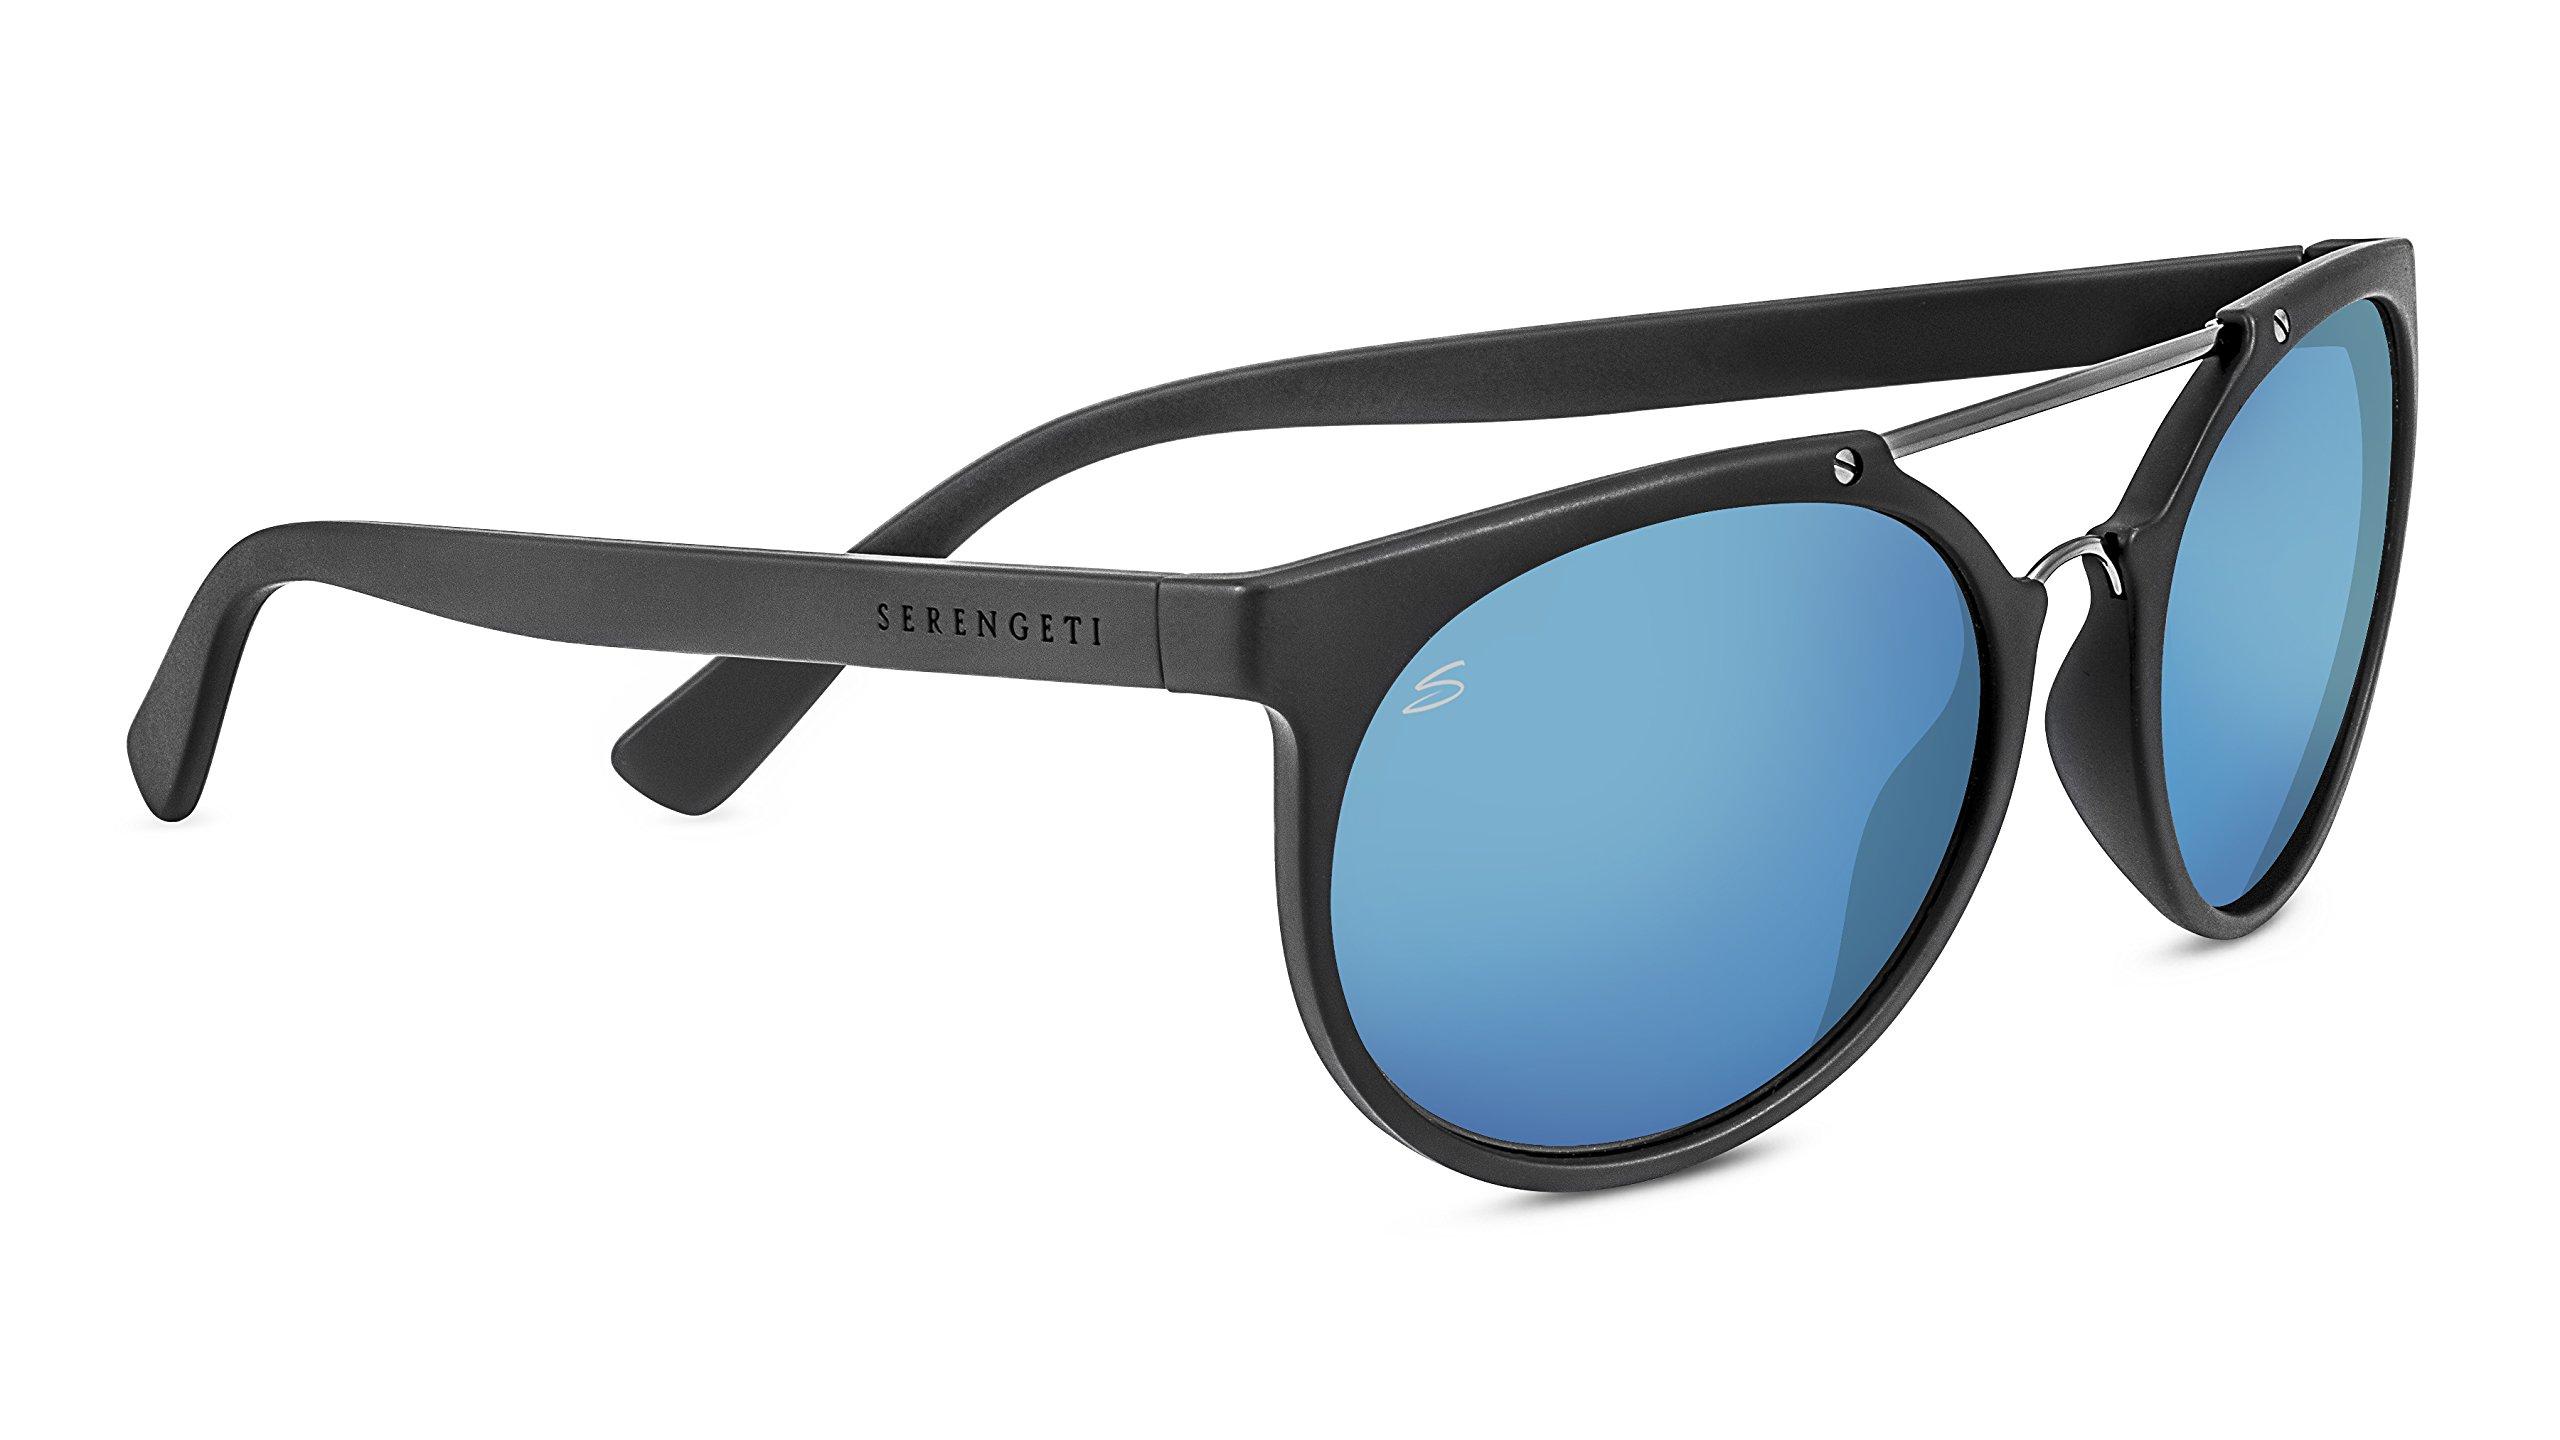 Serengeti 8354 Lerici Polarized 555NM Sunglasses, Sanded Gray/Satin Dark Gun by Serengeti (Image #1)